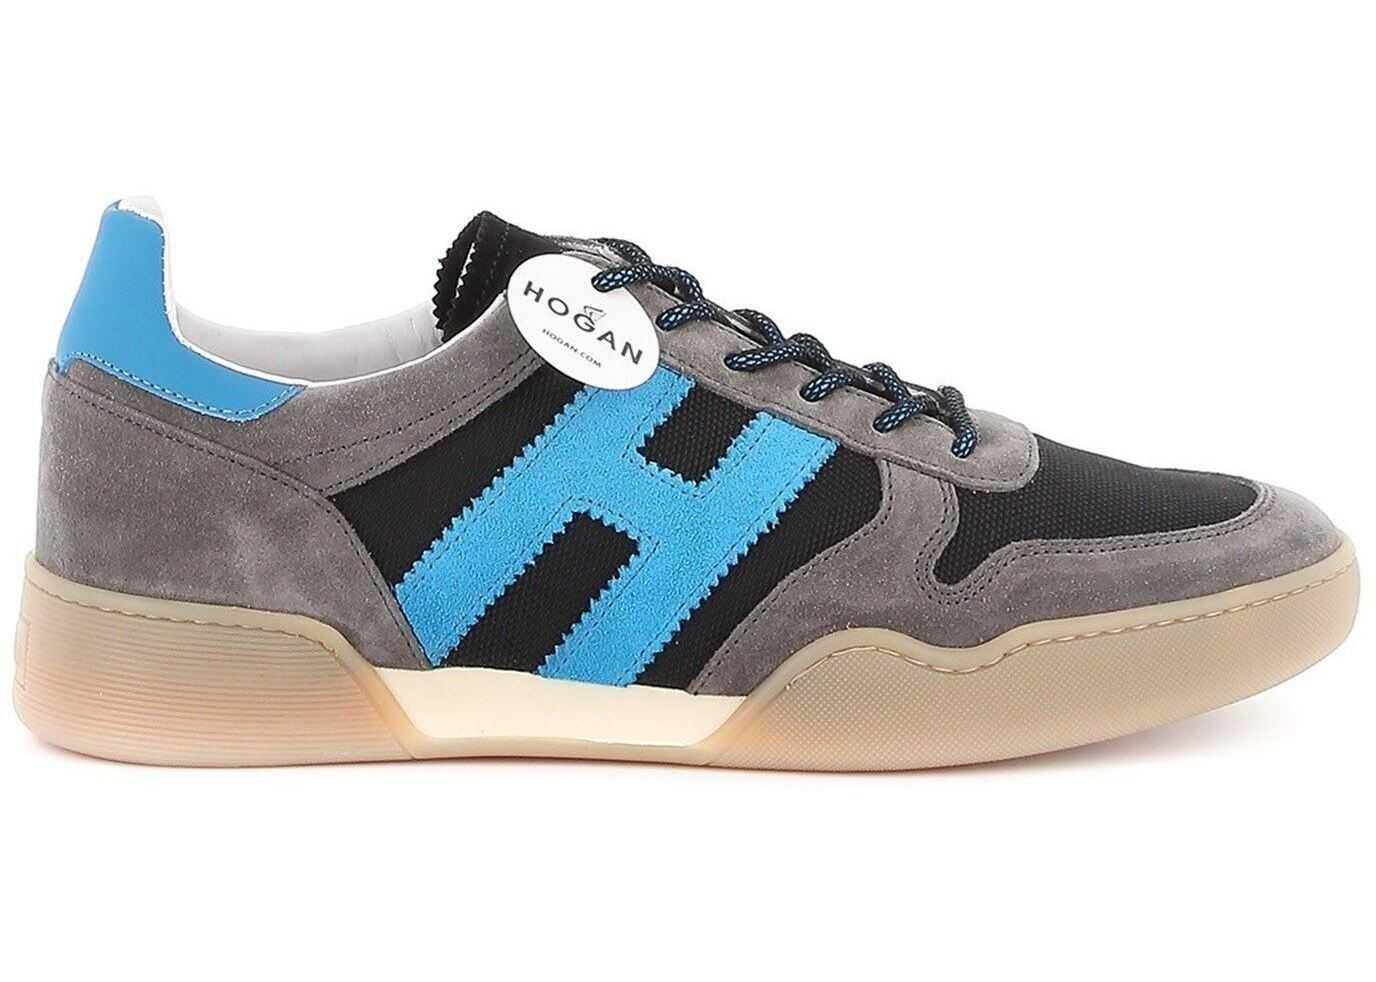 Hogan H357 Sneakers In Black And Grey Grey